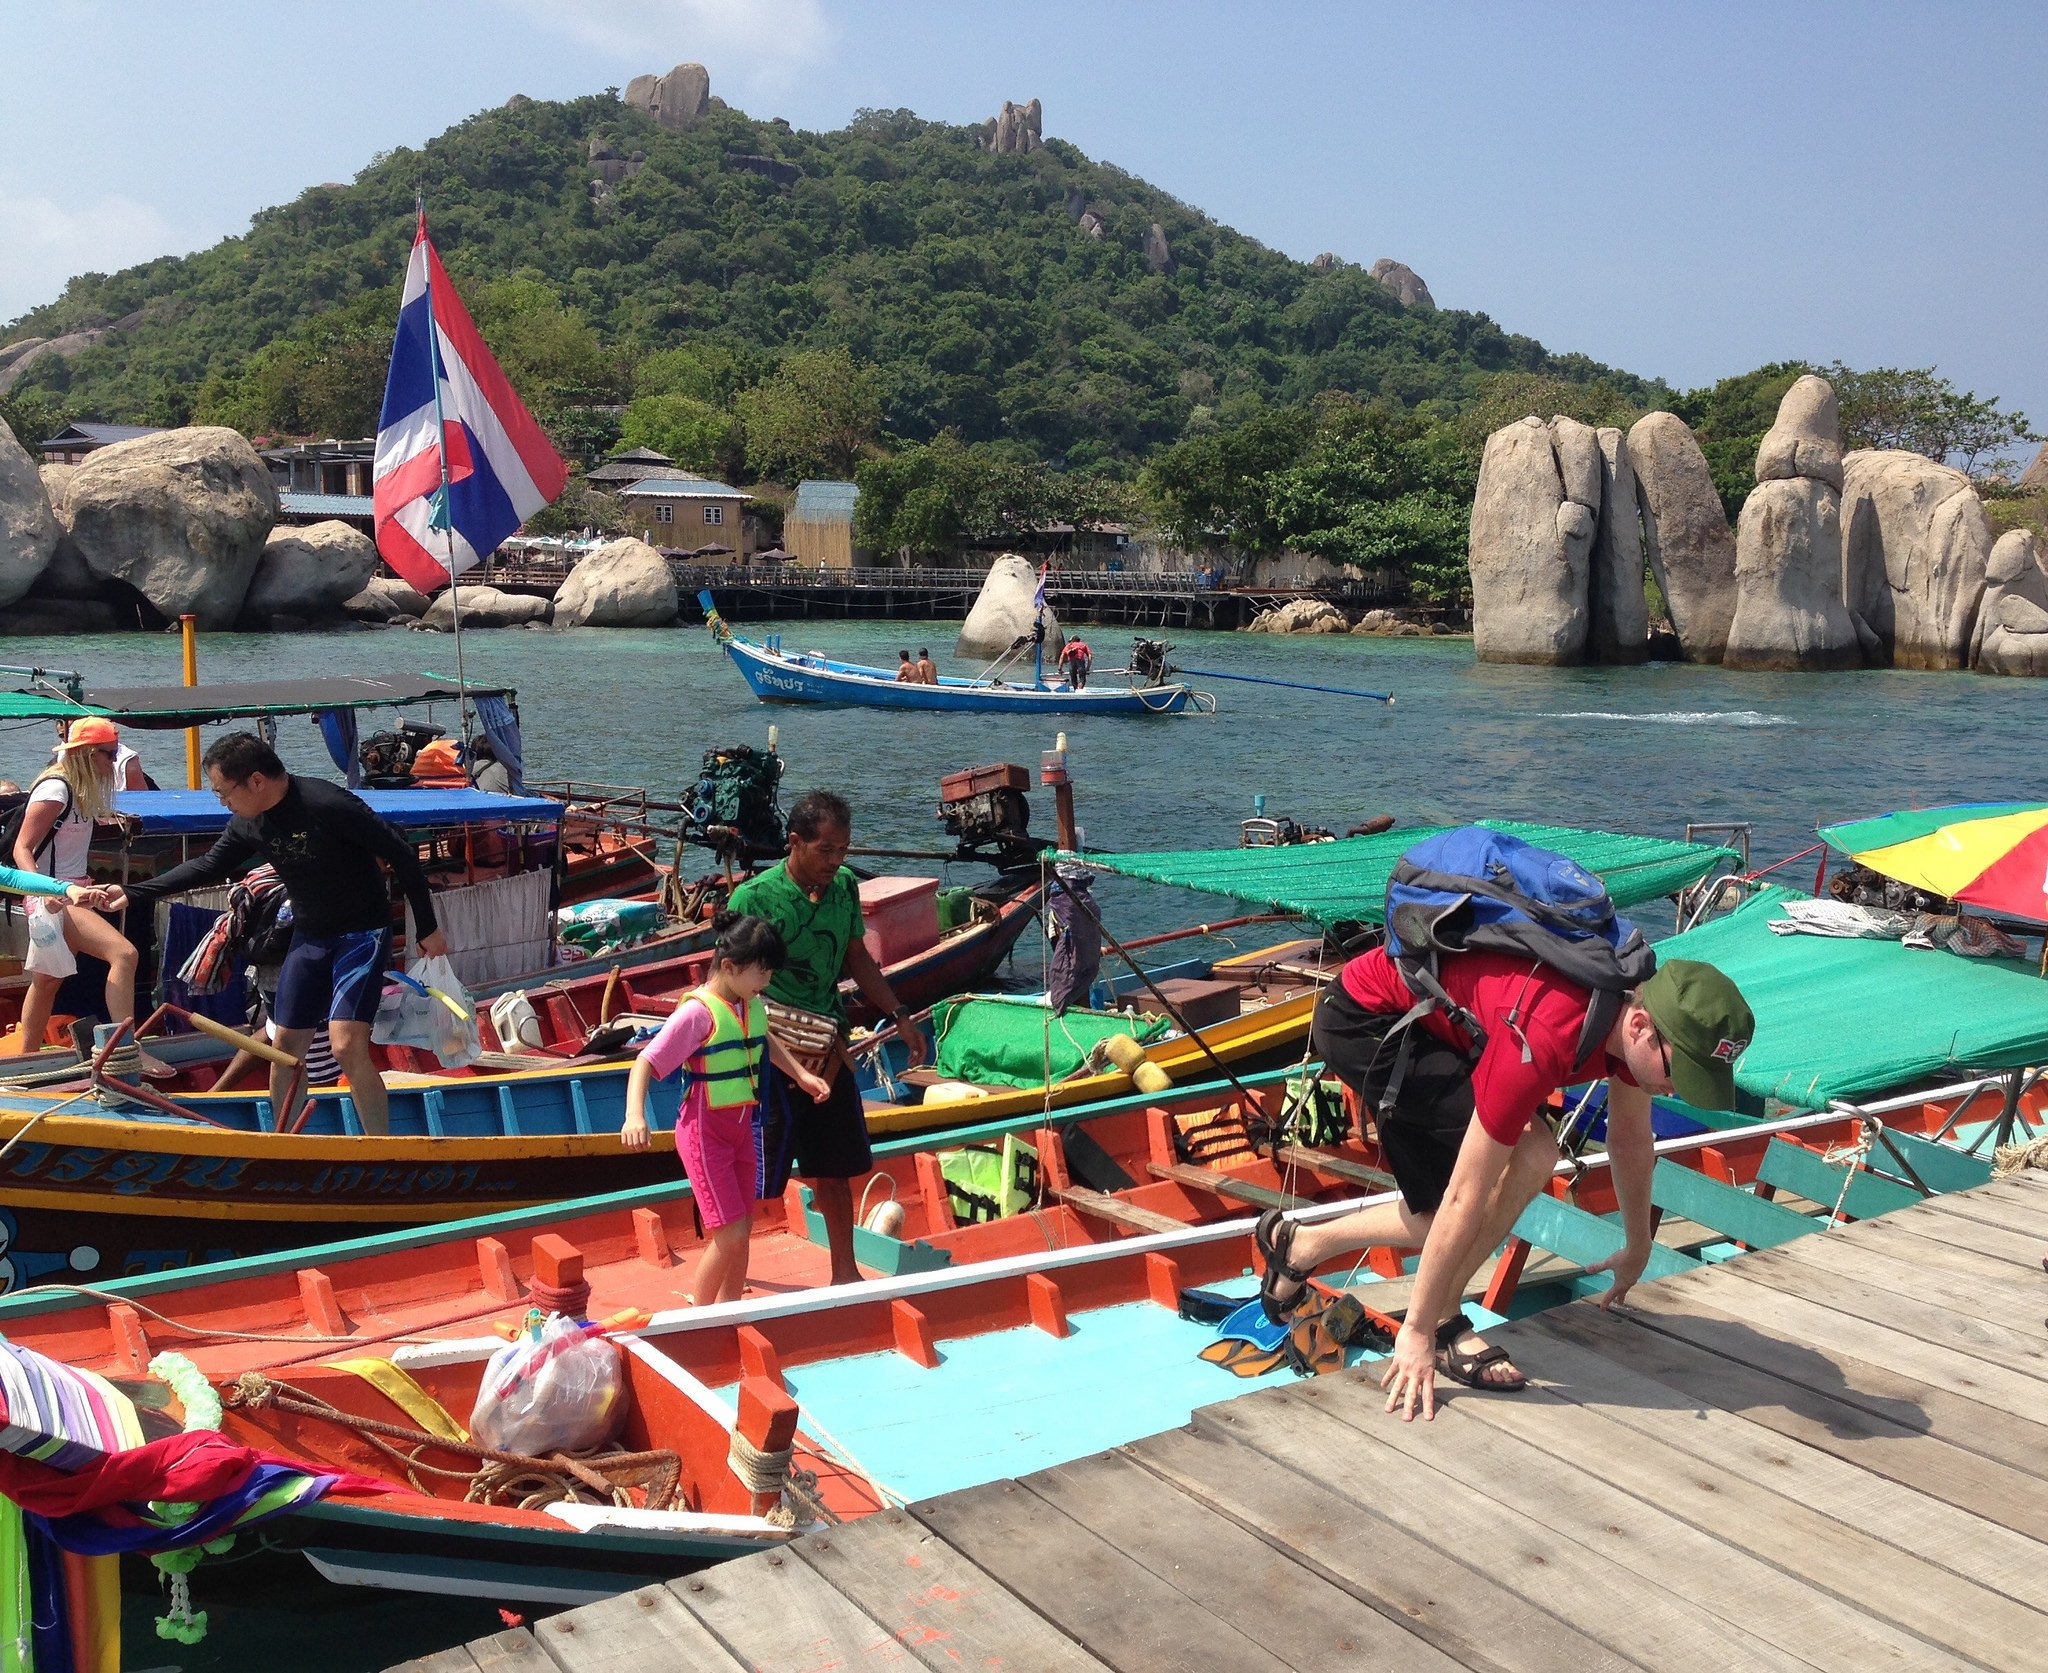 Arriving to Koh Nang Yuan island